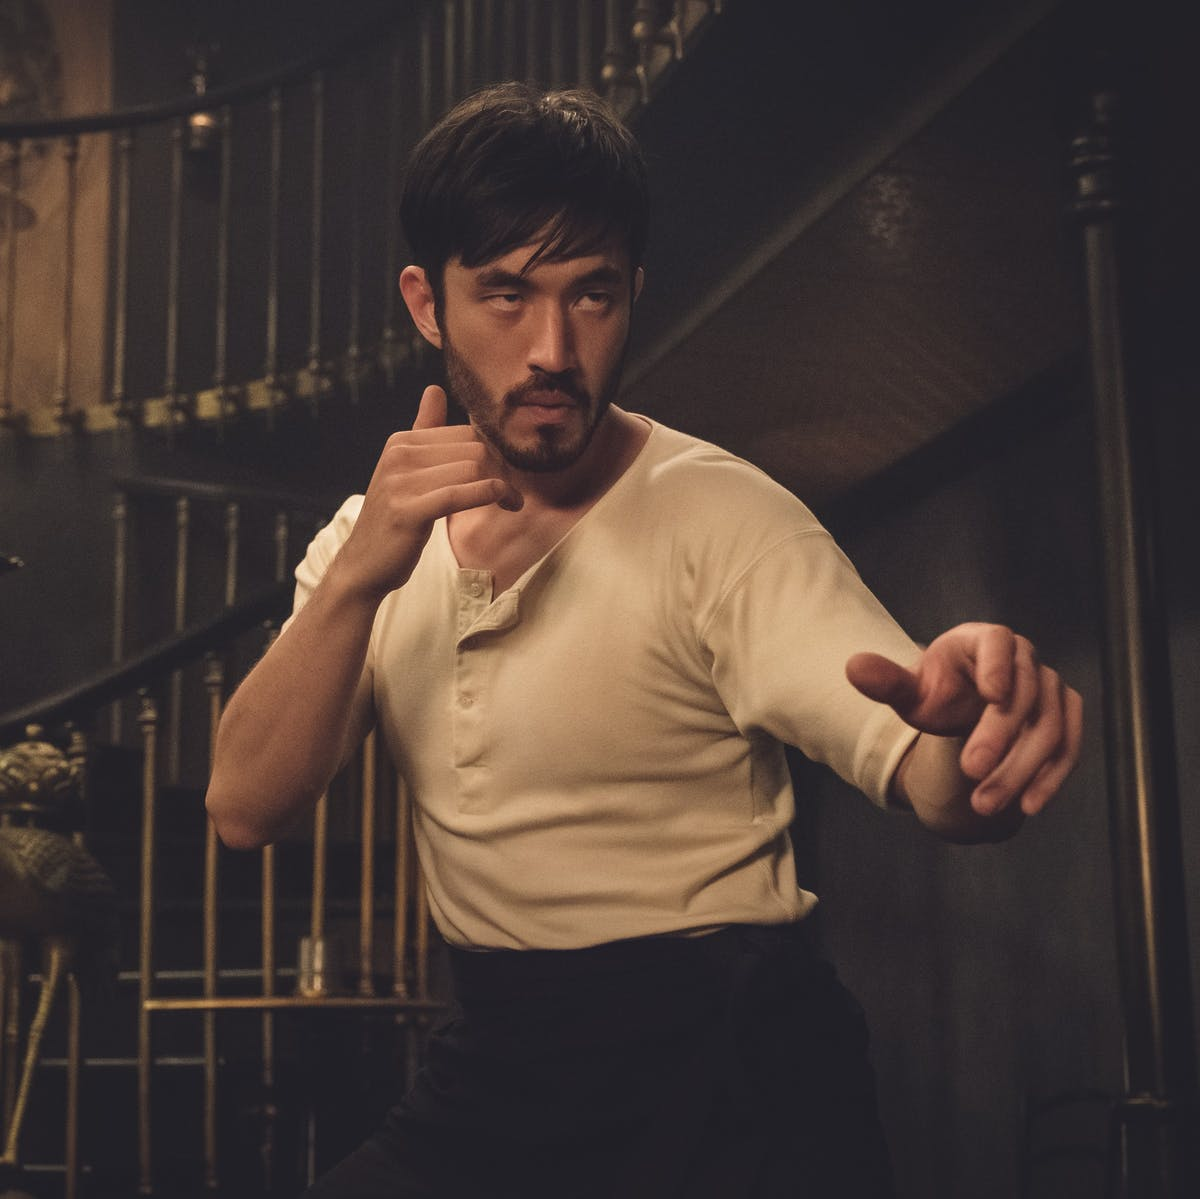 How 'Warrior' Portrays Bruce Lee's MMA Style, Jeet Kune Do